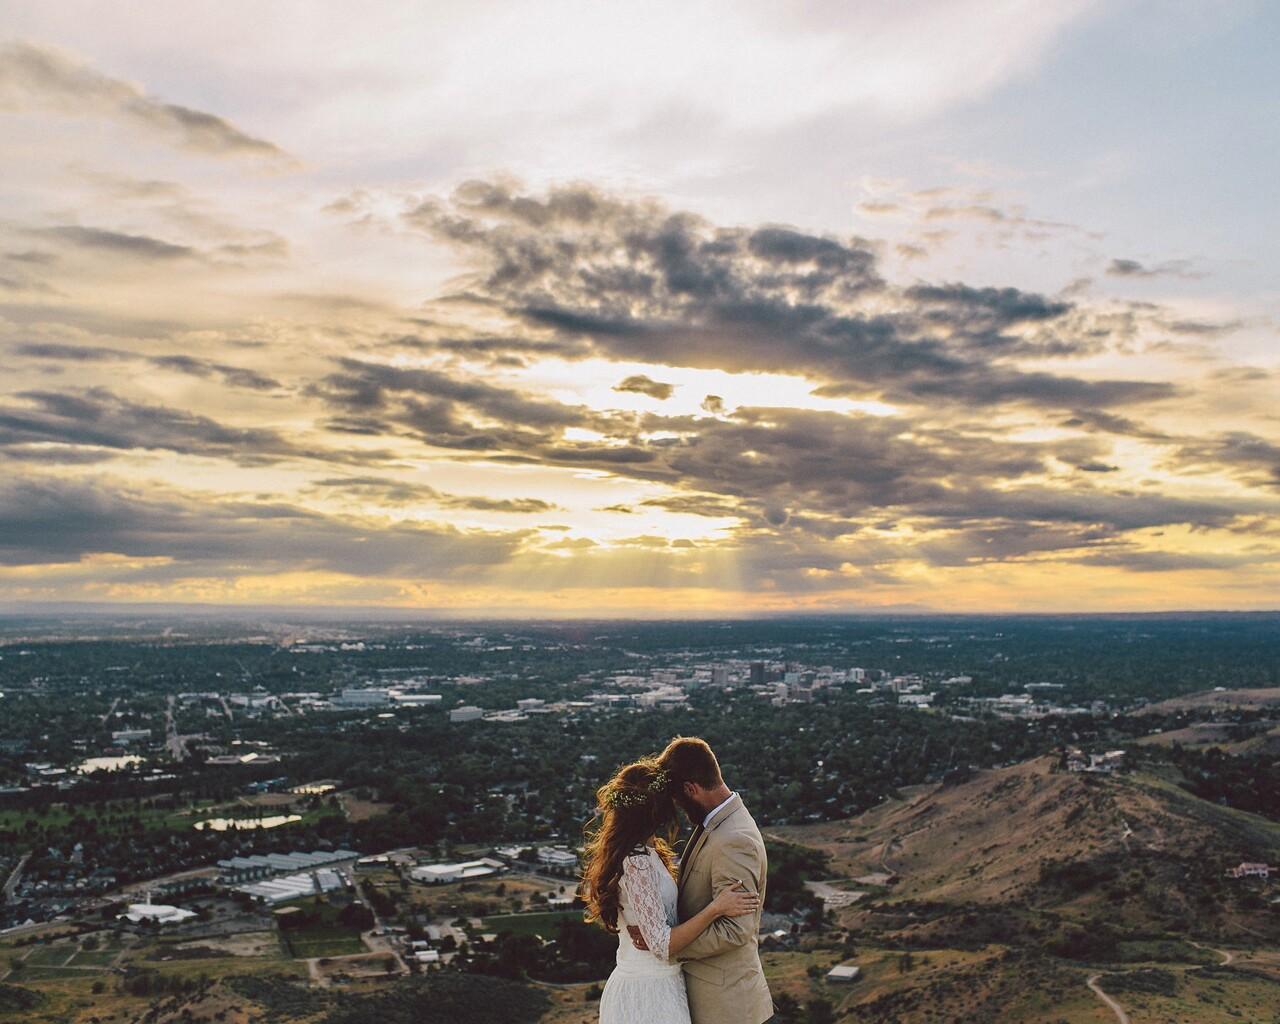 just-married-pic.jpg